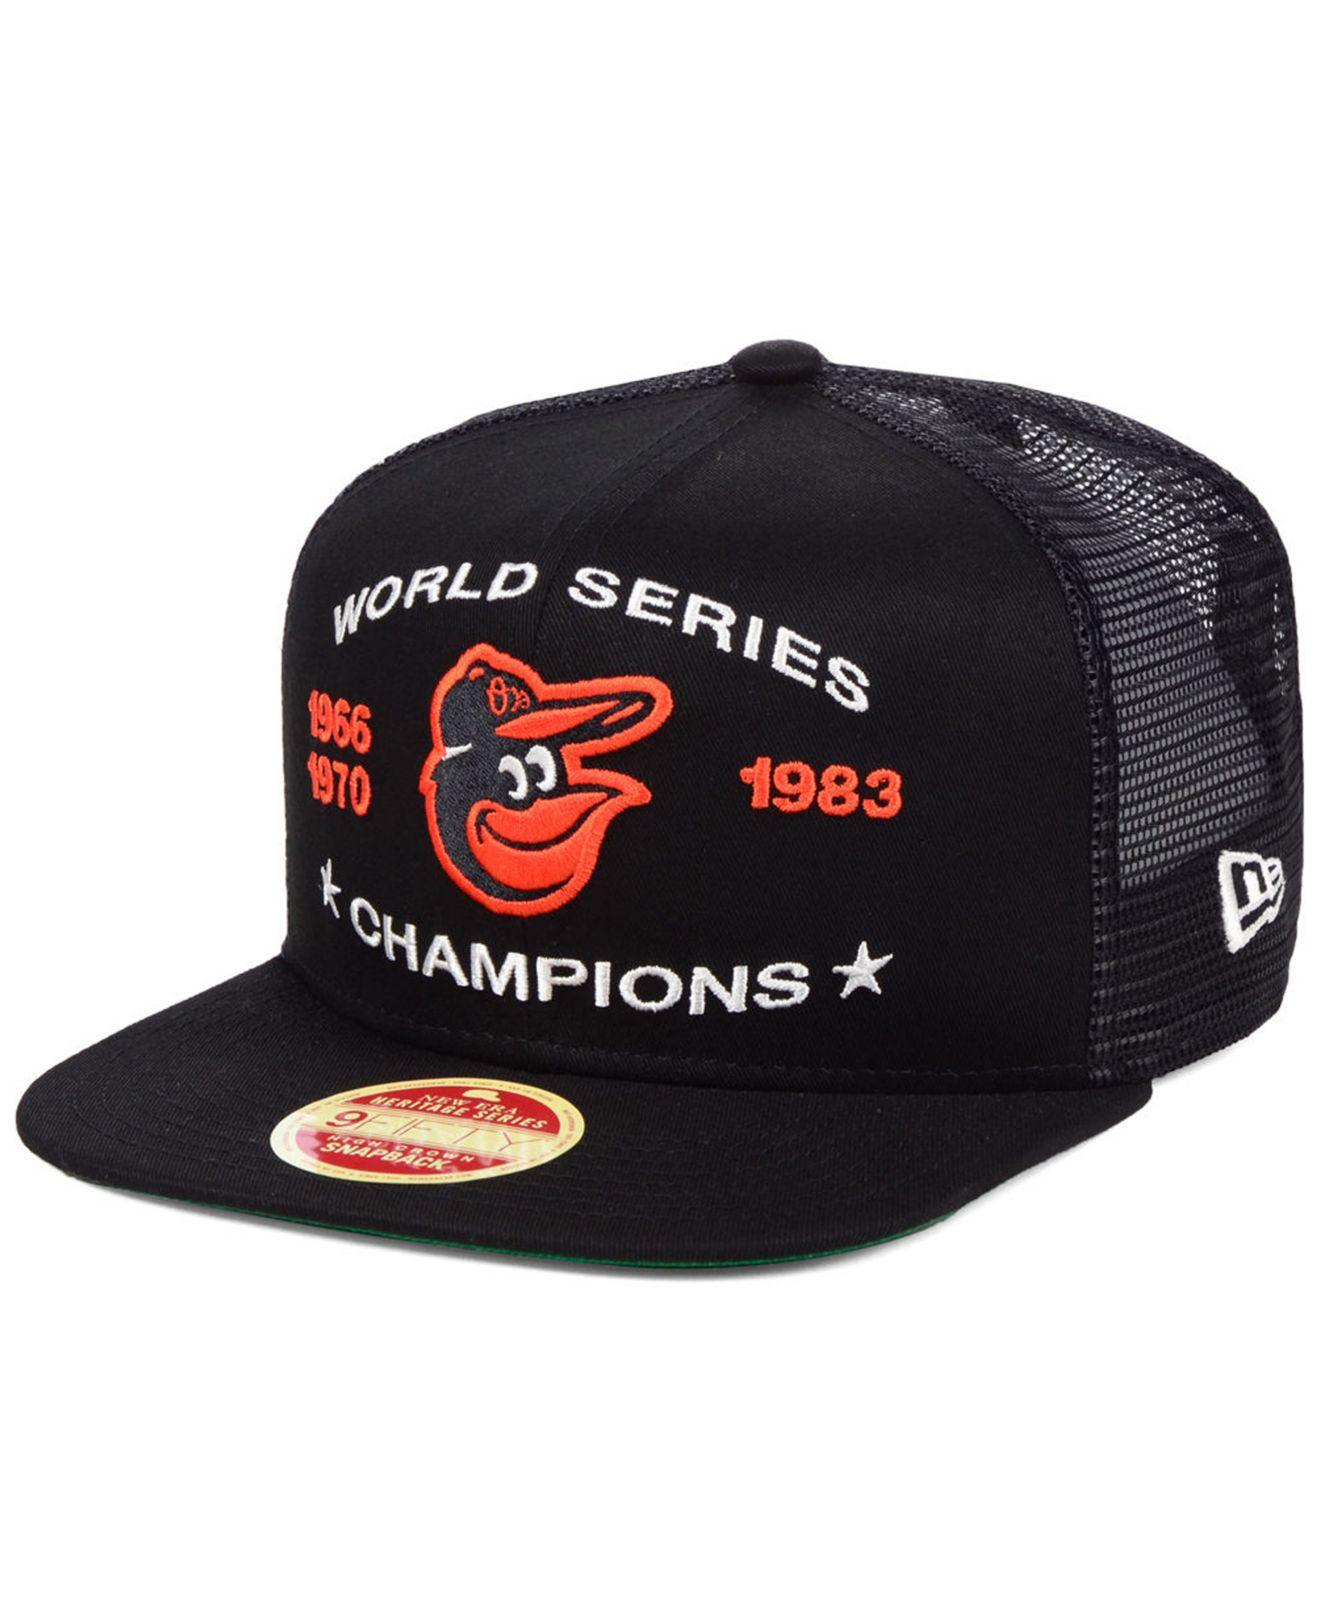 online store 1bcf1 2e117 KTZ - Black Baltimore Orioles Team Front Trucker 9fifty Snapback Cap for Men  - Lyst. View fullscreen